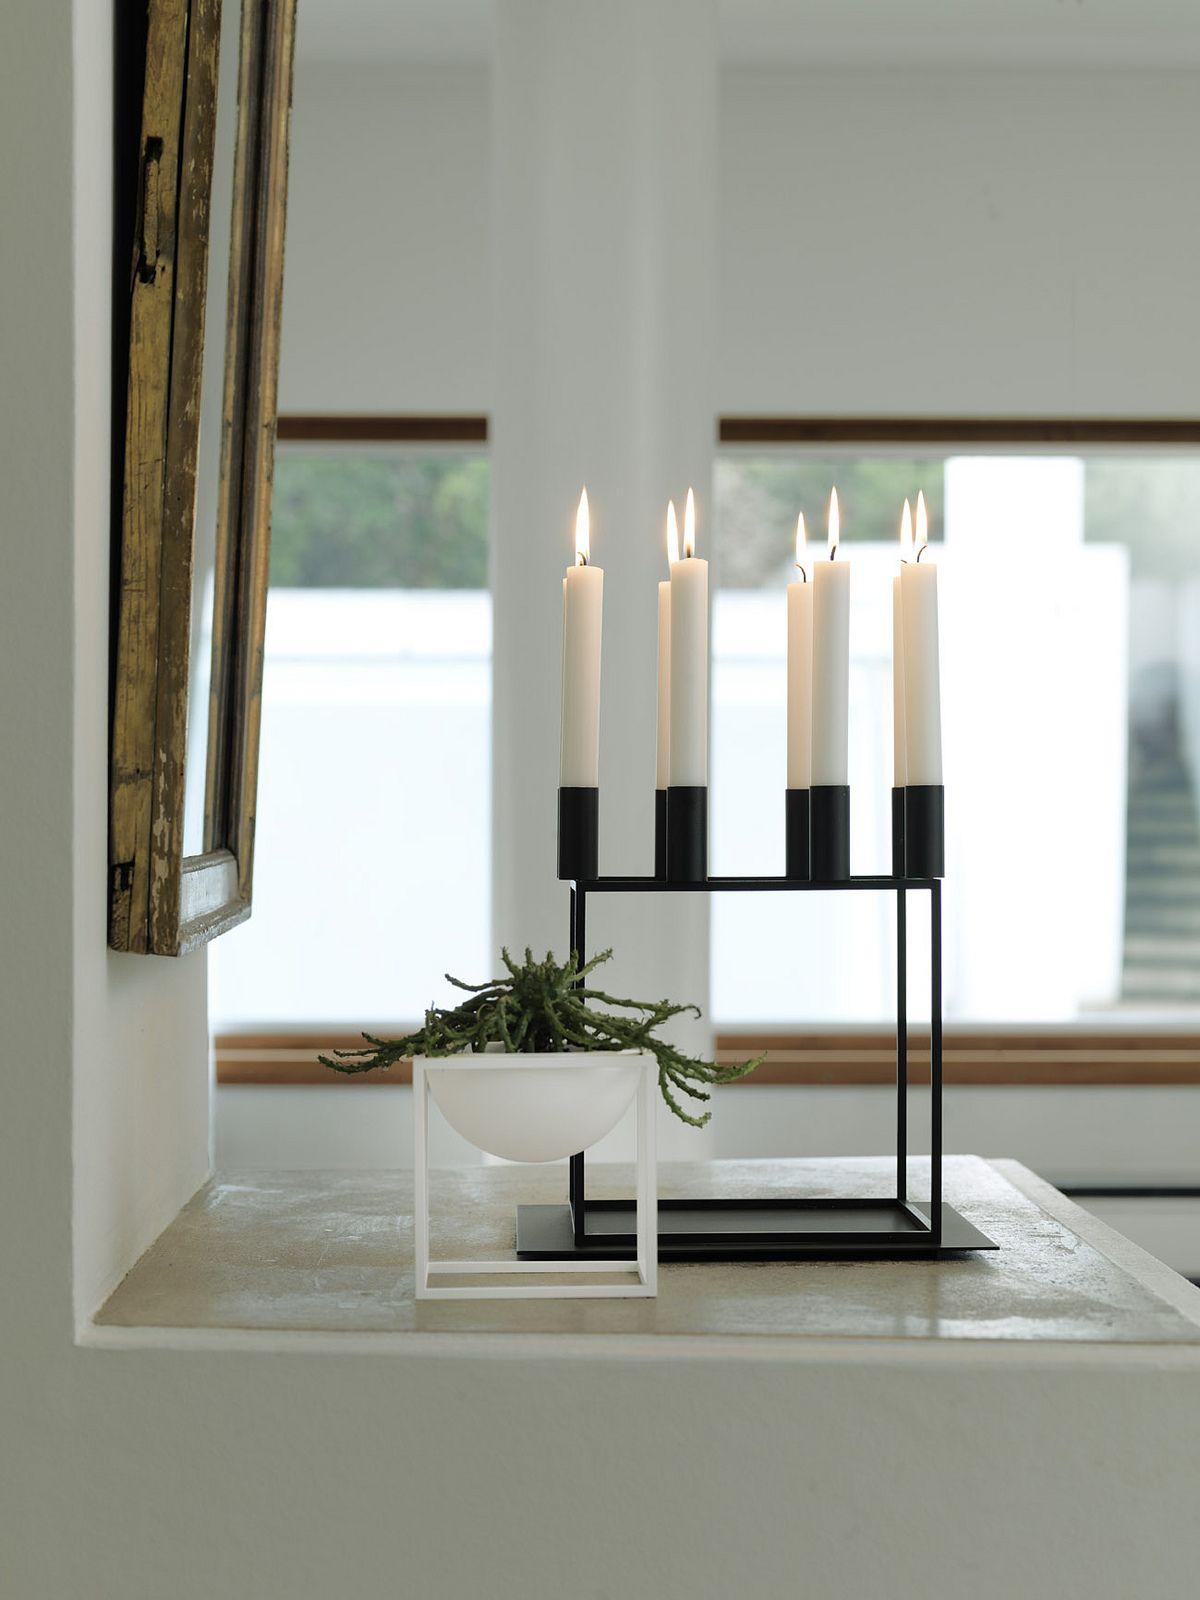 Kubus White Steel Metal Scandinavian And Danish Bowl Kubus Black Candleholder By Lassen Available O Black Candle Holders Scandinavian Home Home Accessories